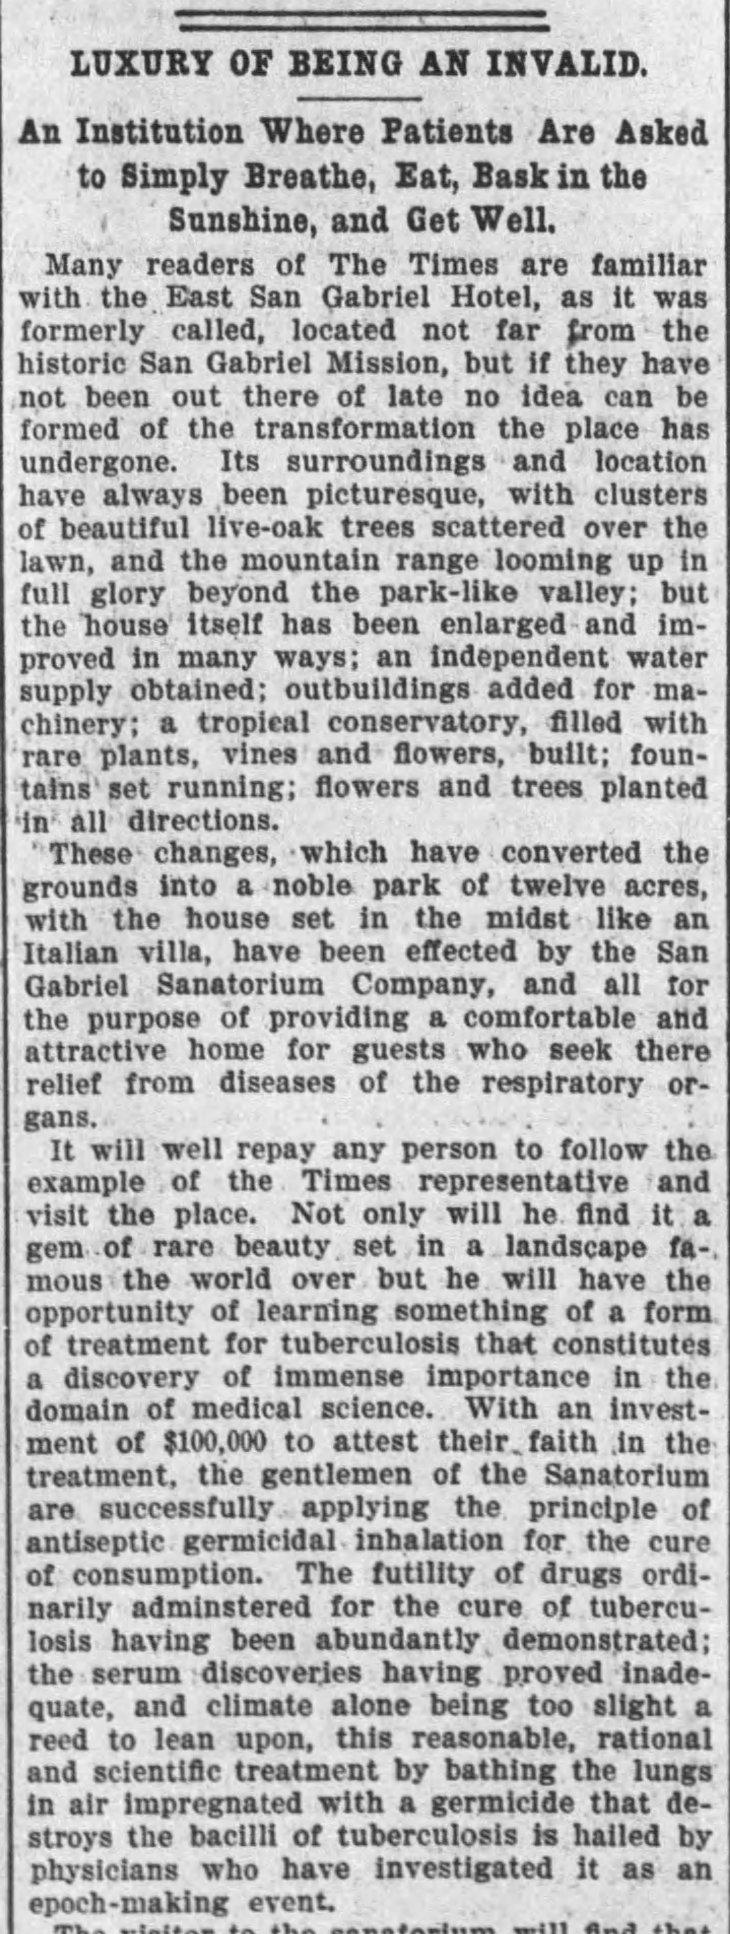 Luxury of Being an Invalid Times_Nov_6__1898_.jpg